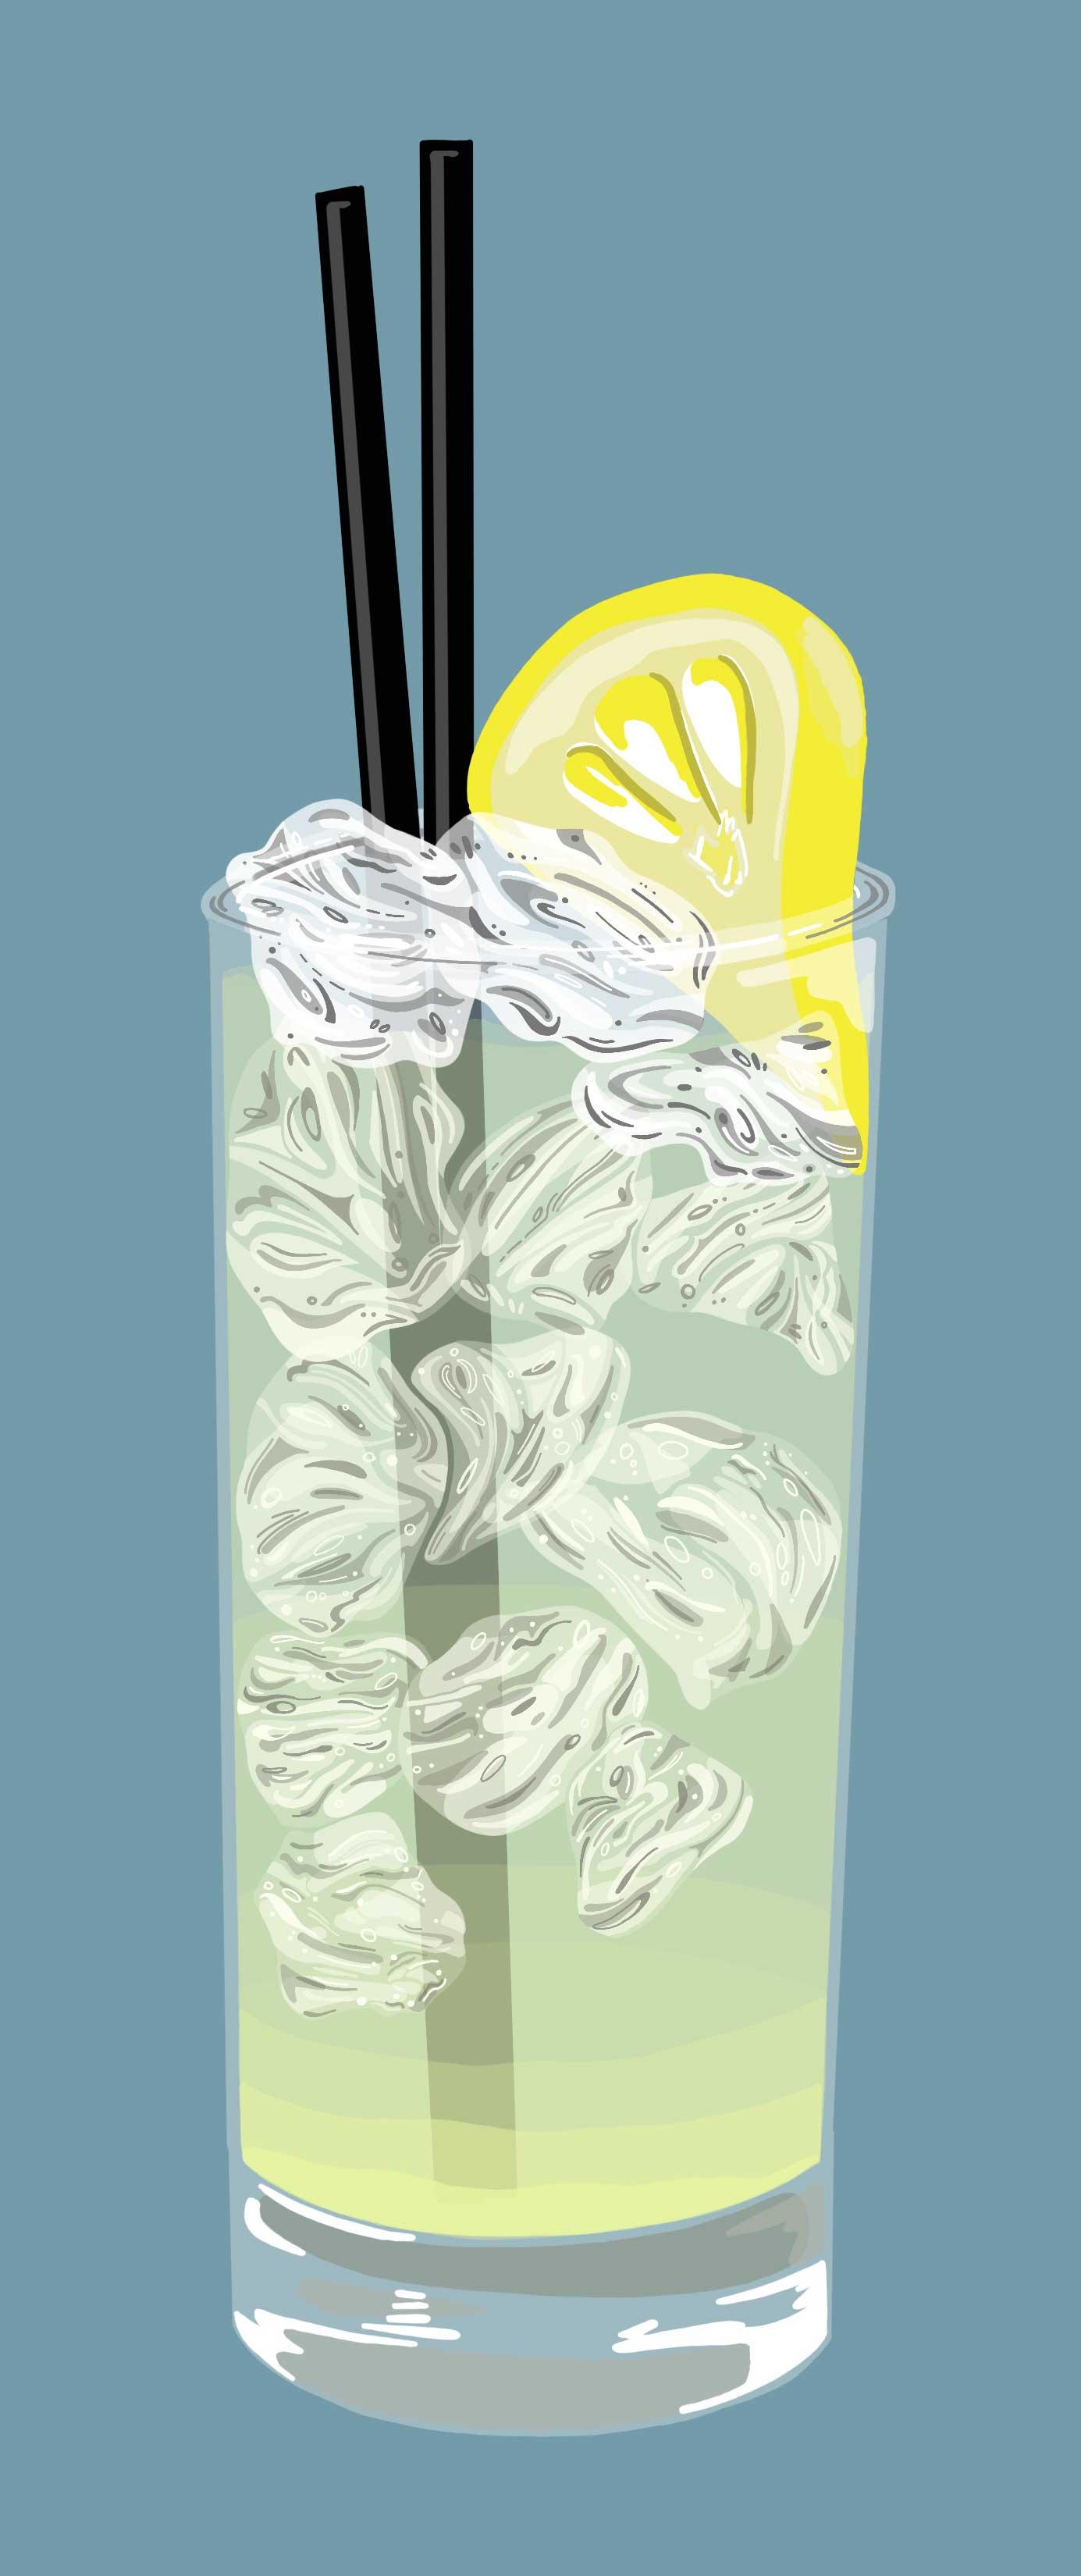 Lemonaide_SS.jpg